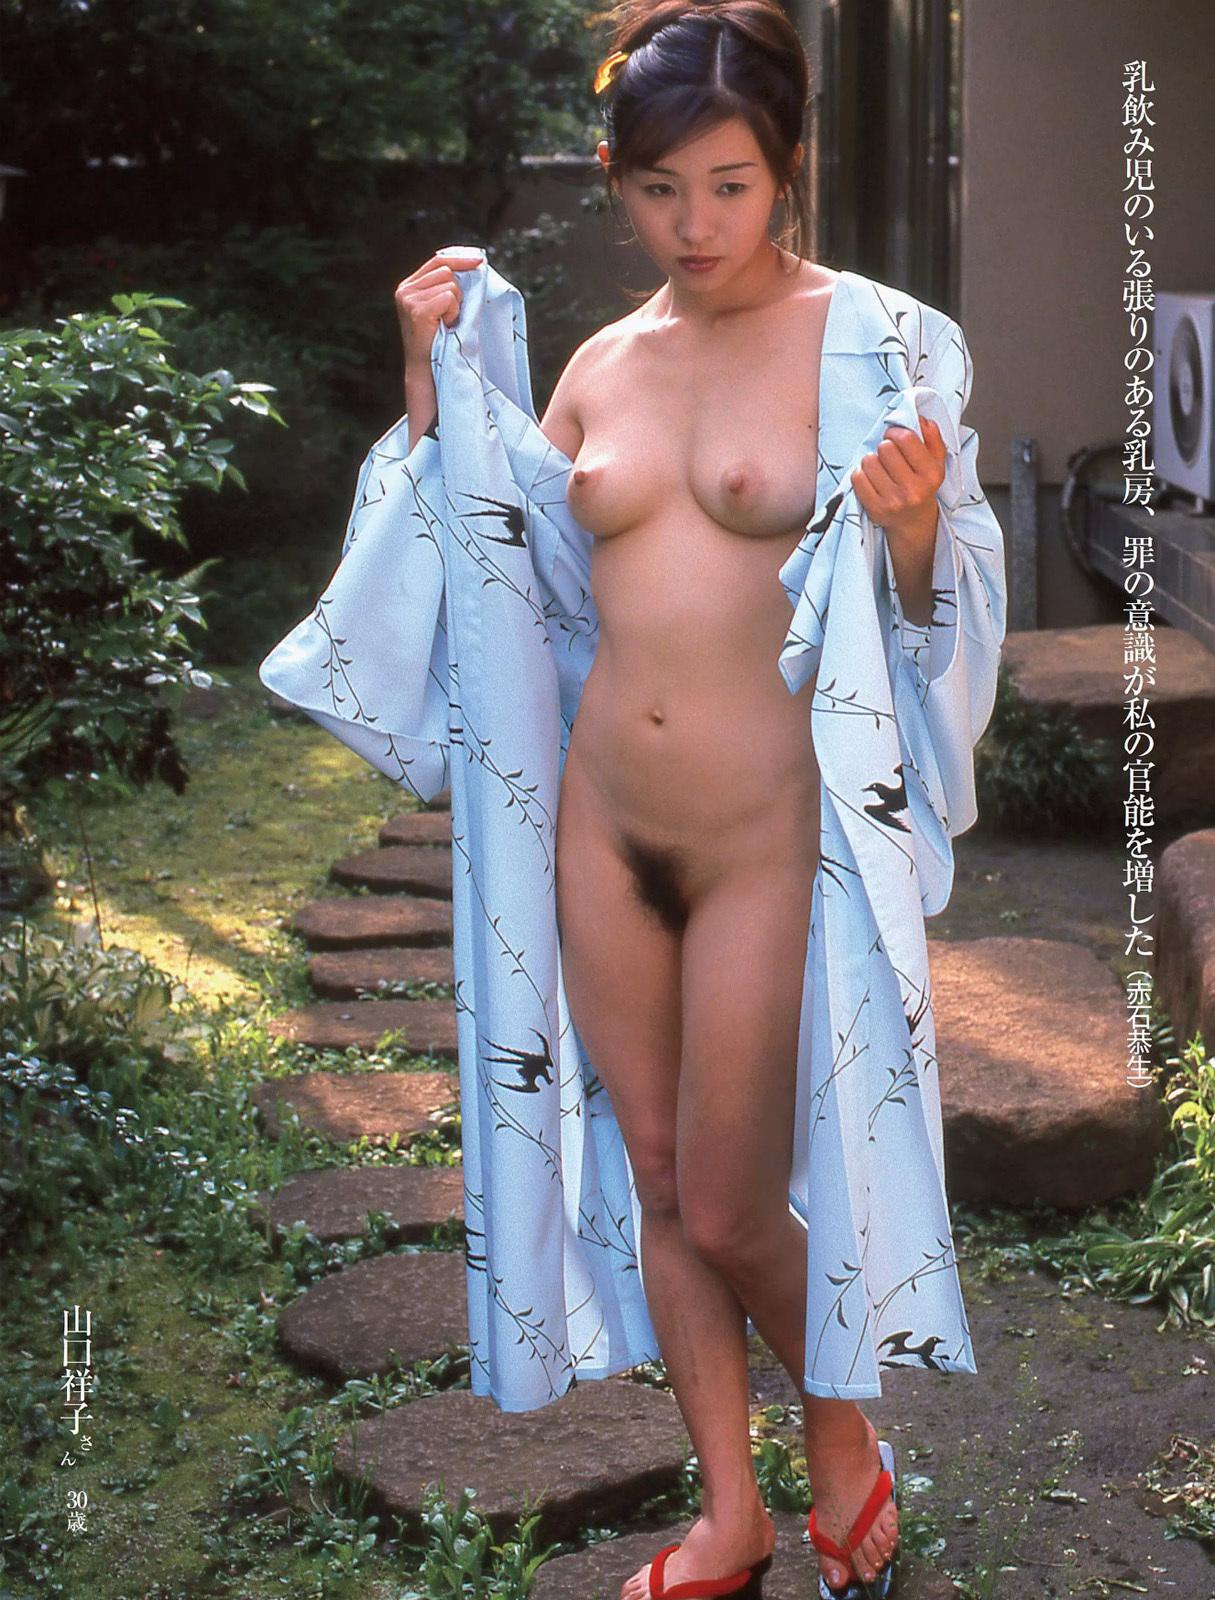 富士出版 水野聡子熟女ヌード Free Porn pics, Nude Sex Photos, XXX Photos Galleries